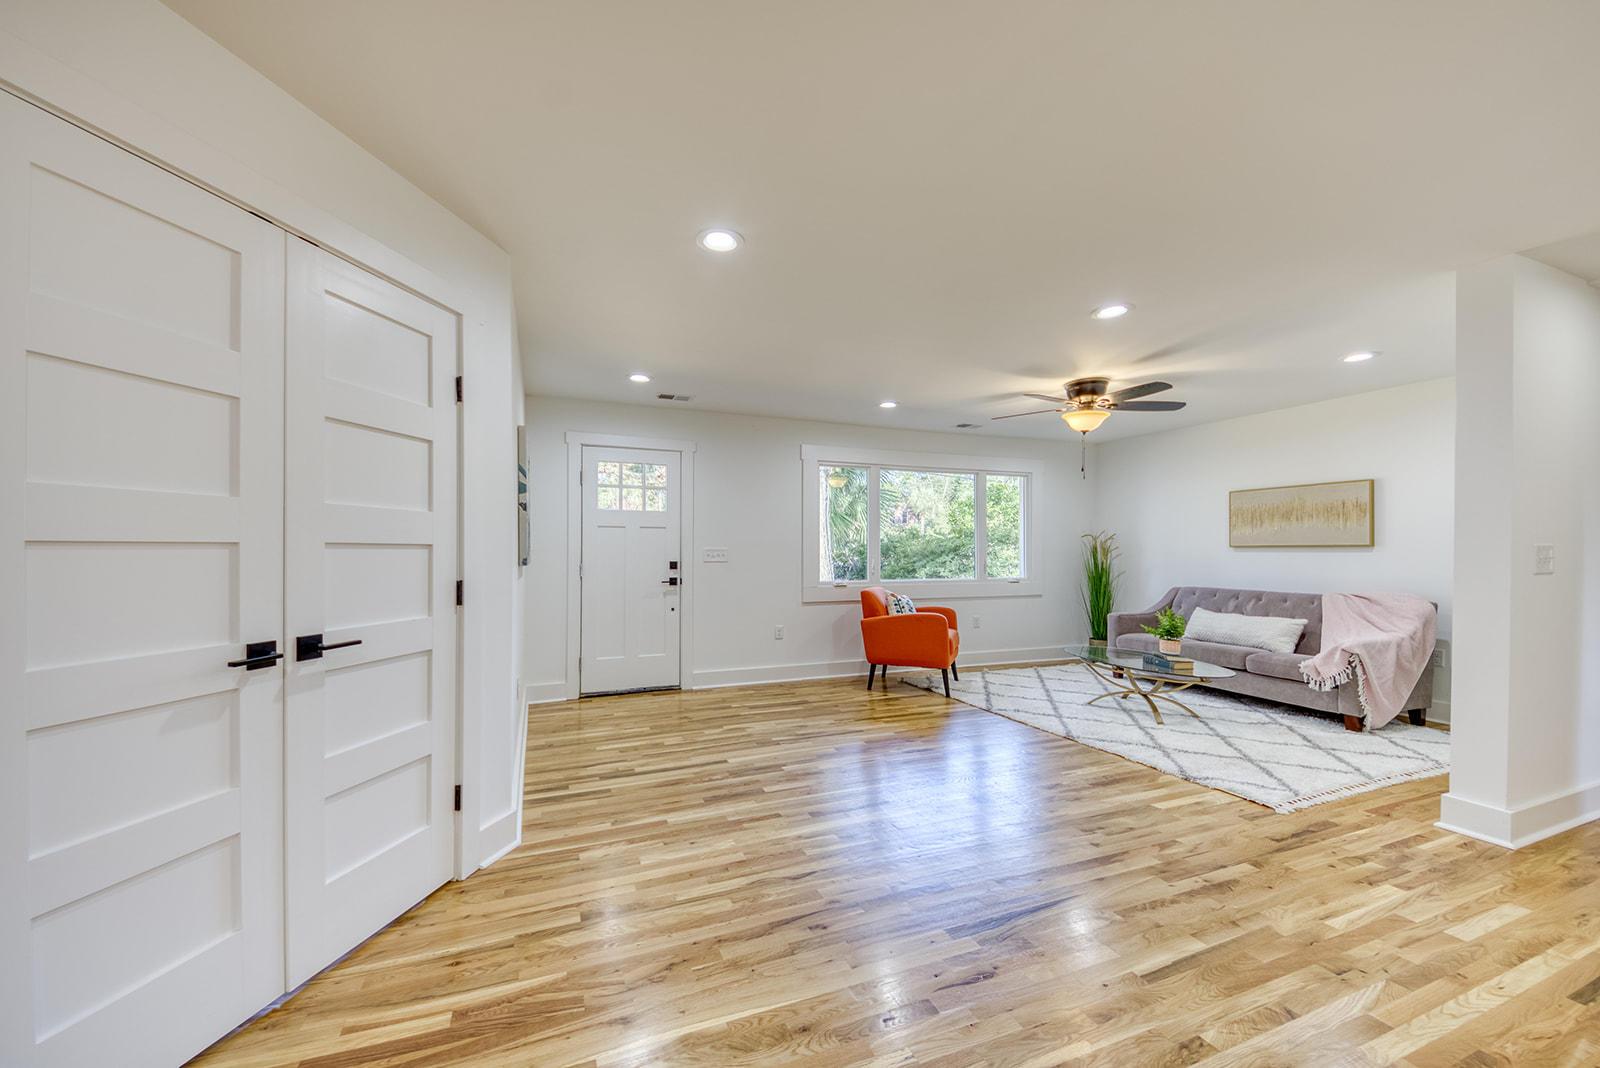 Bay View Acres Homes For Sale - 265 Coleman, Mount Pleasant, SC - 35